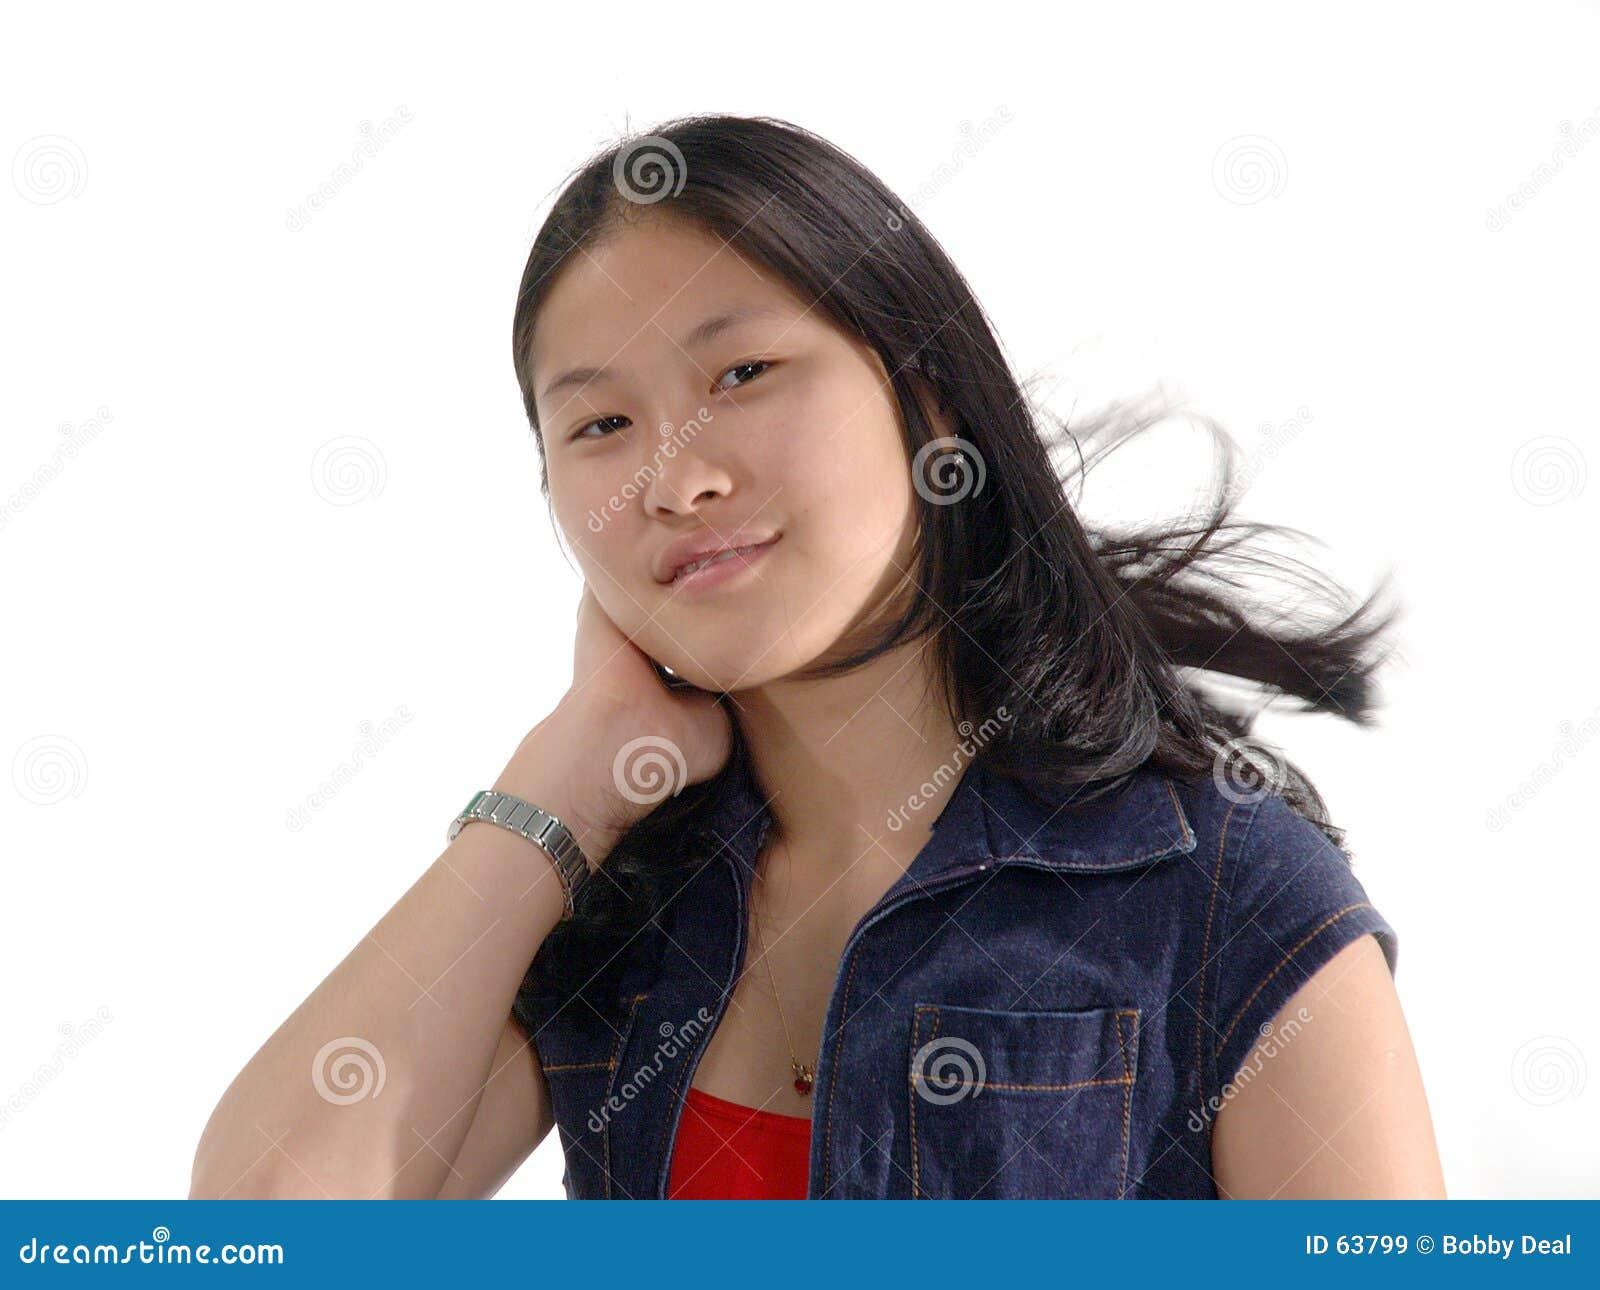 Download ικανοποιημένο κορίτσι ε&kap Στοκ Εικόνα - εικόνα από εύθυμος, άνθρωποι: 63799